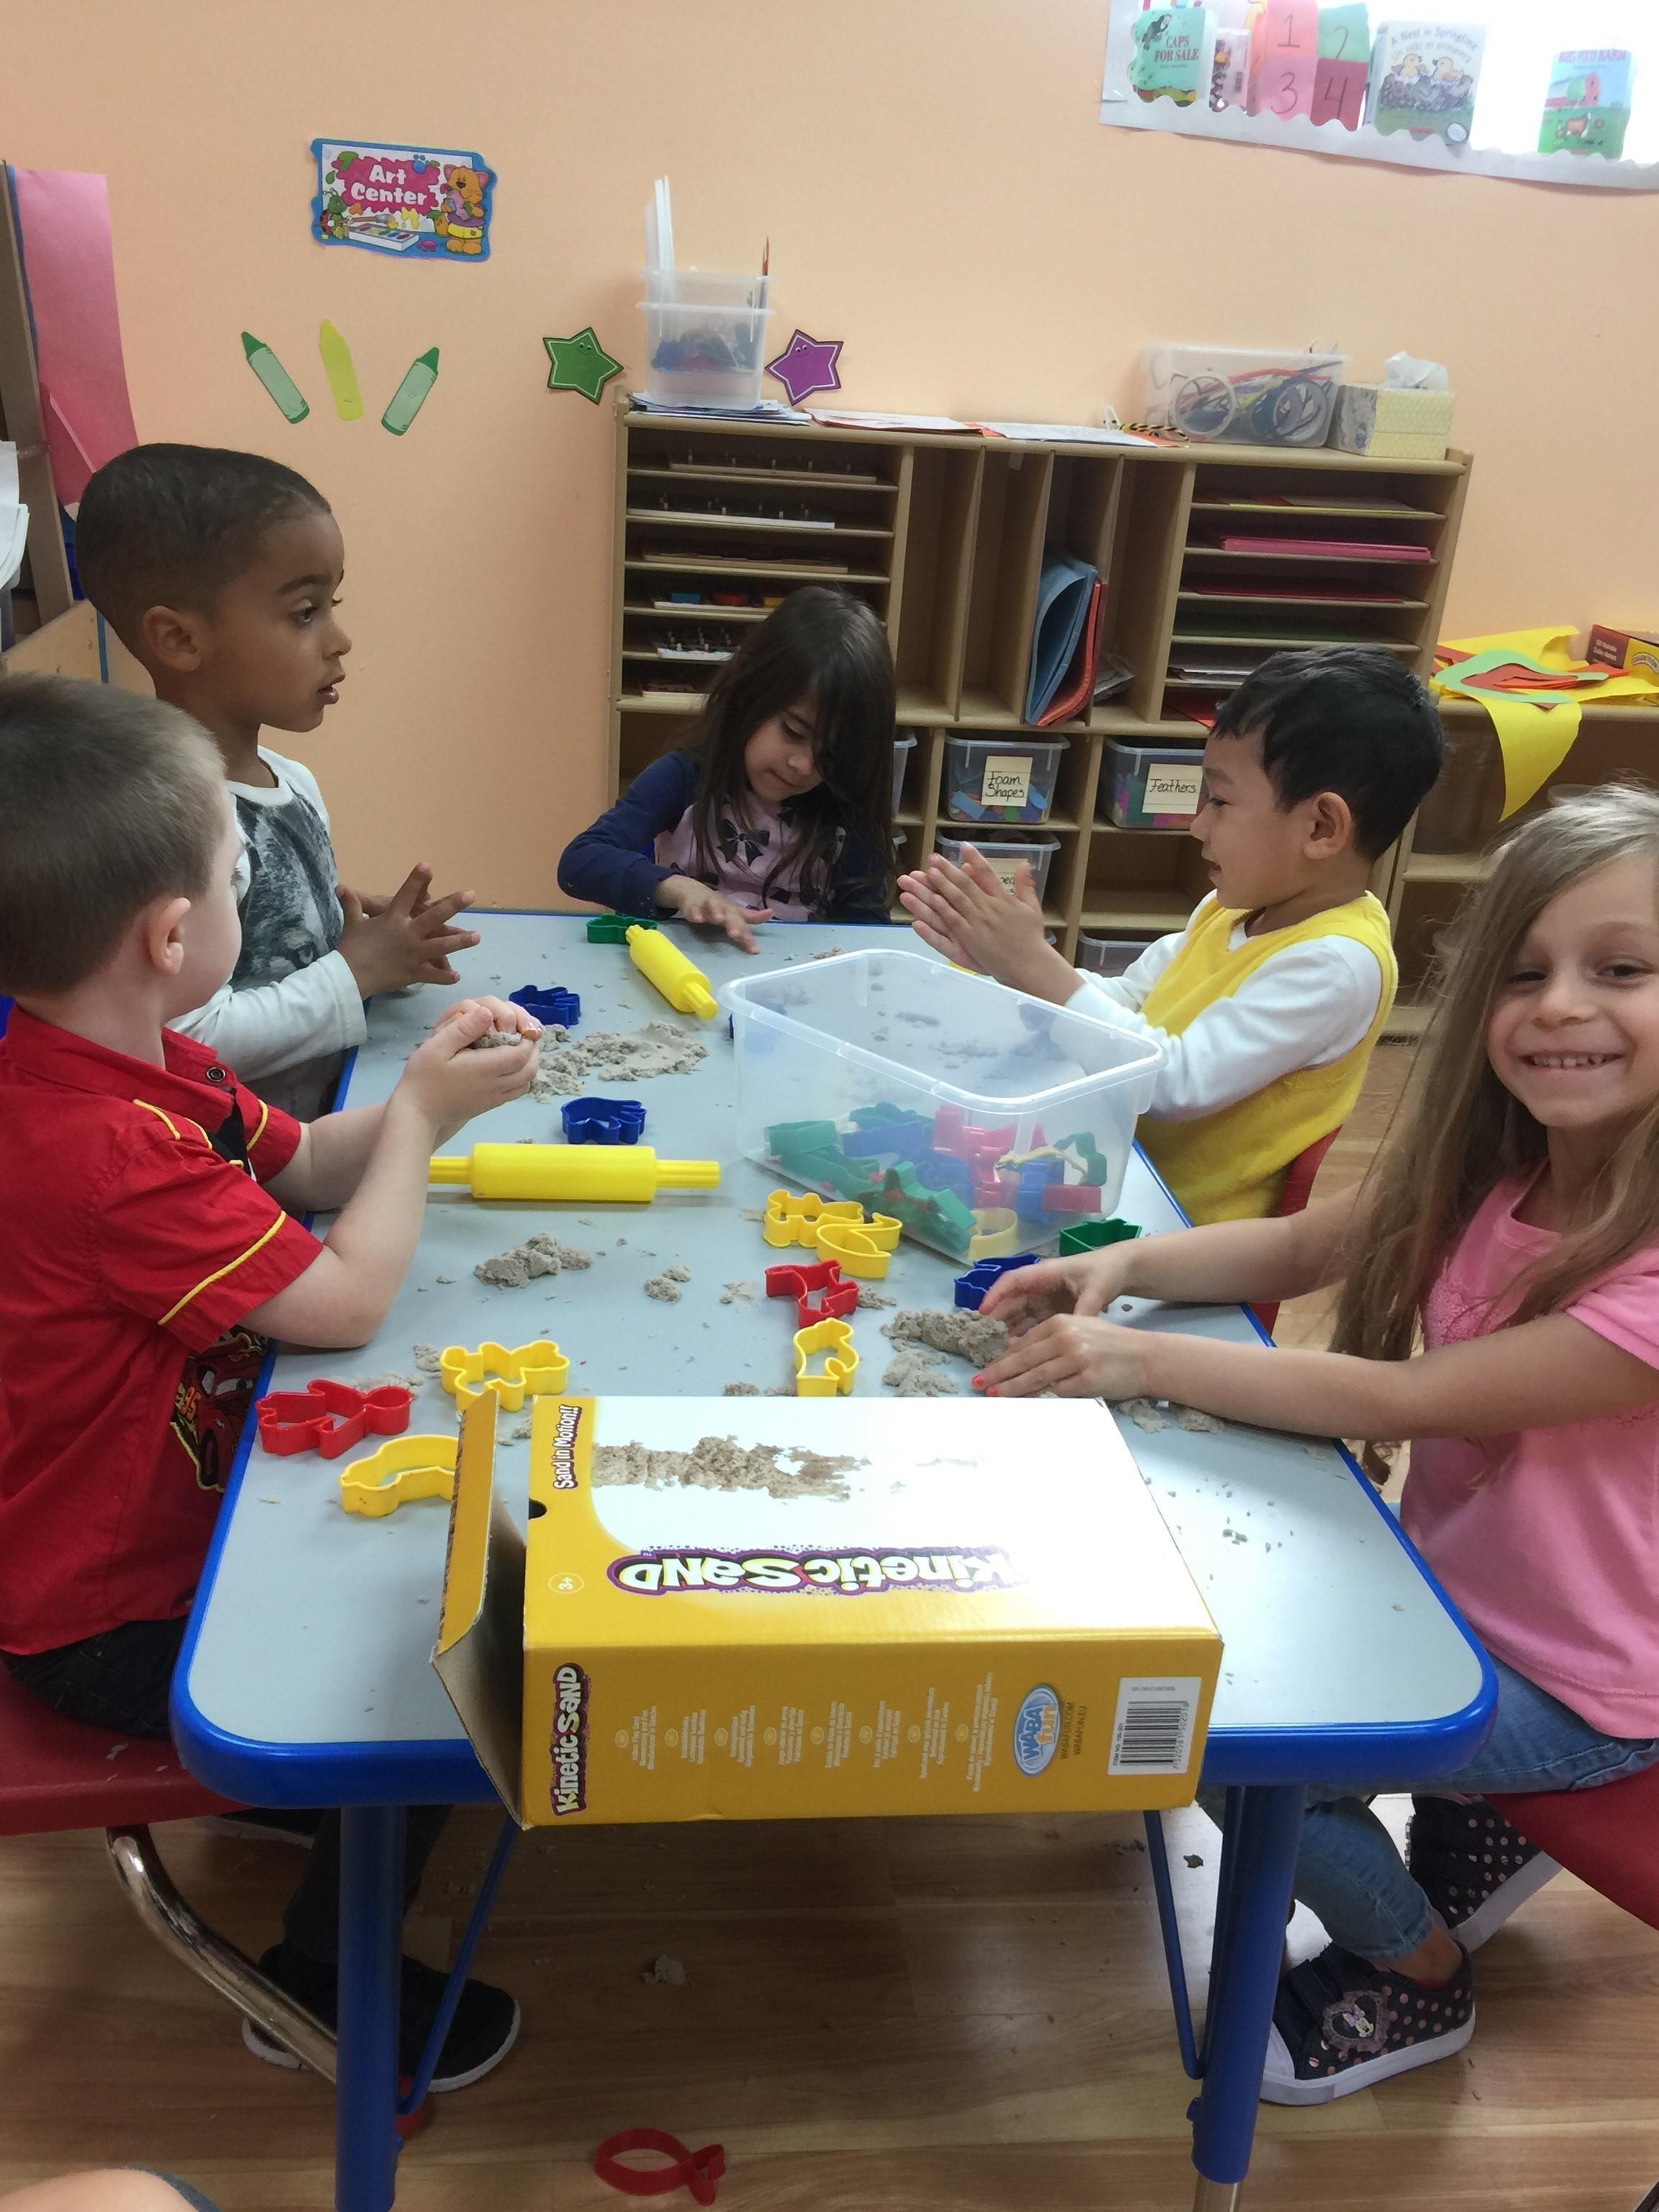 New Milestone Preschool Coupons Near Me In Astoria 8coupons